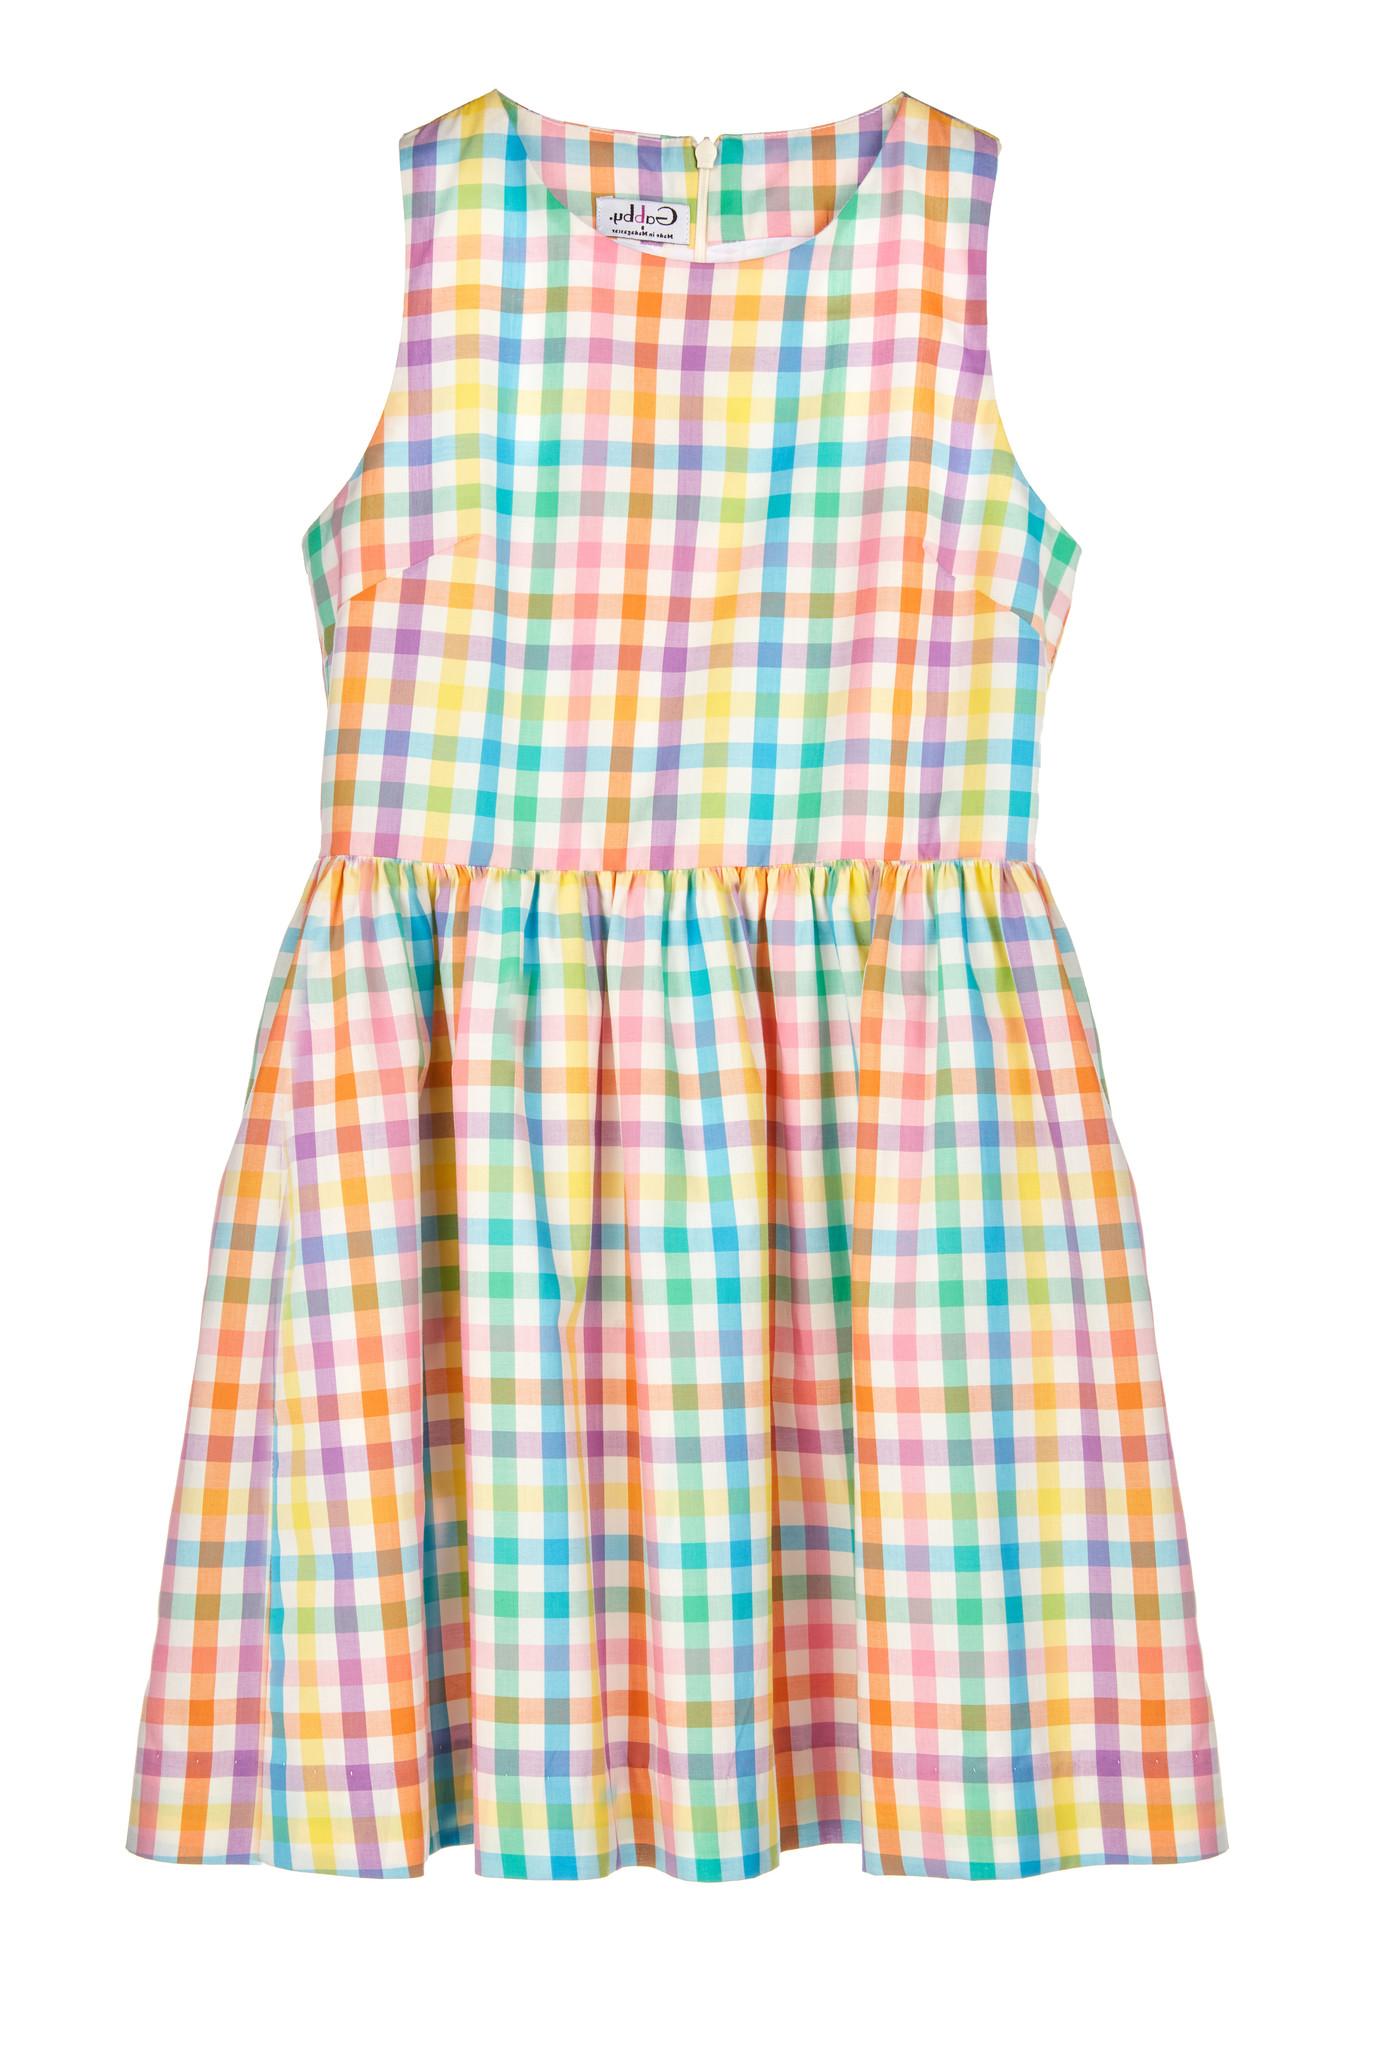 Gabby. Aqua Summer Check Dress